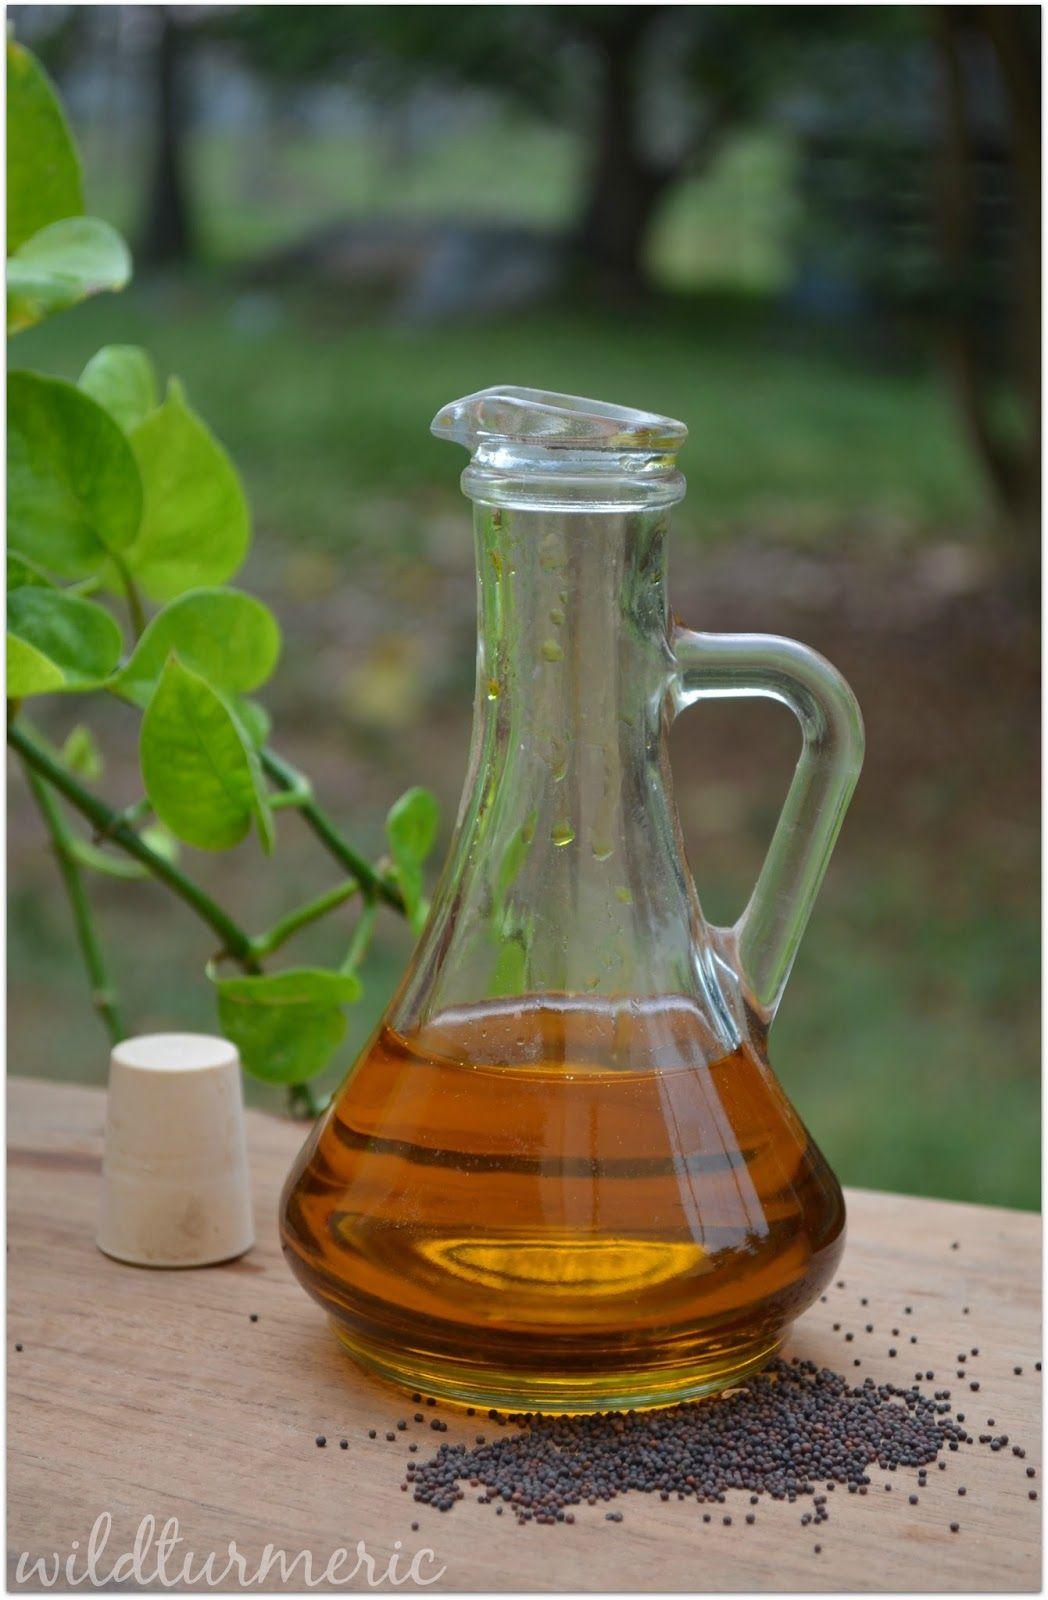 5 Top Hair, Skin & Health Benefits & Uses Of Mustard Oil